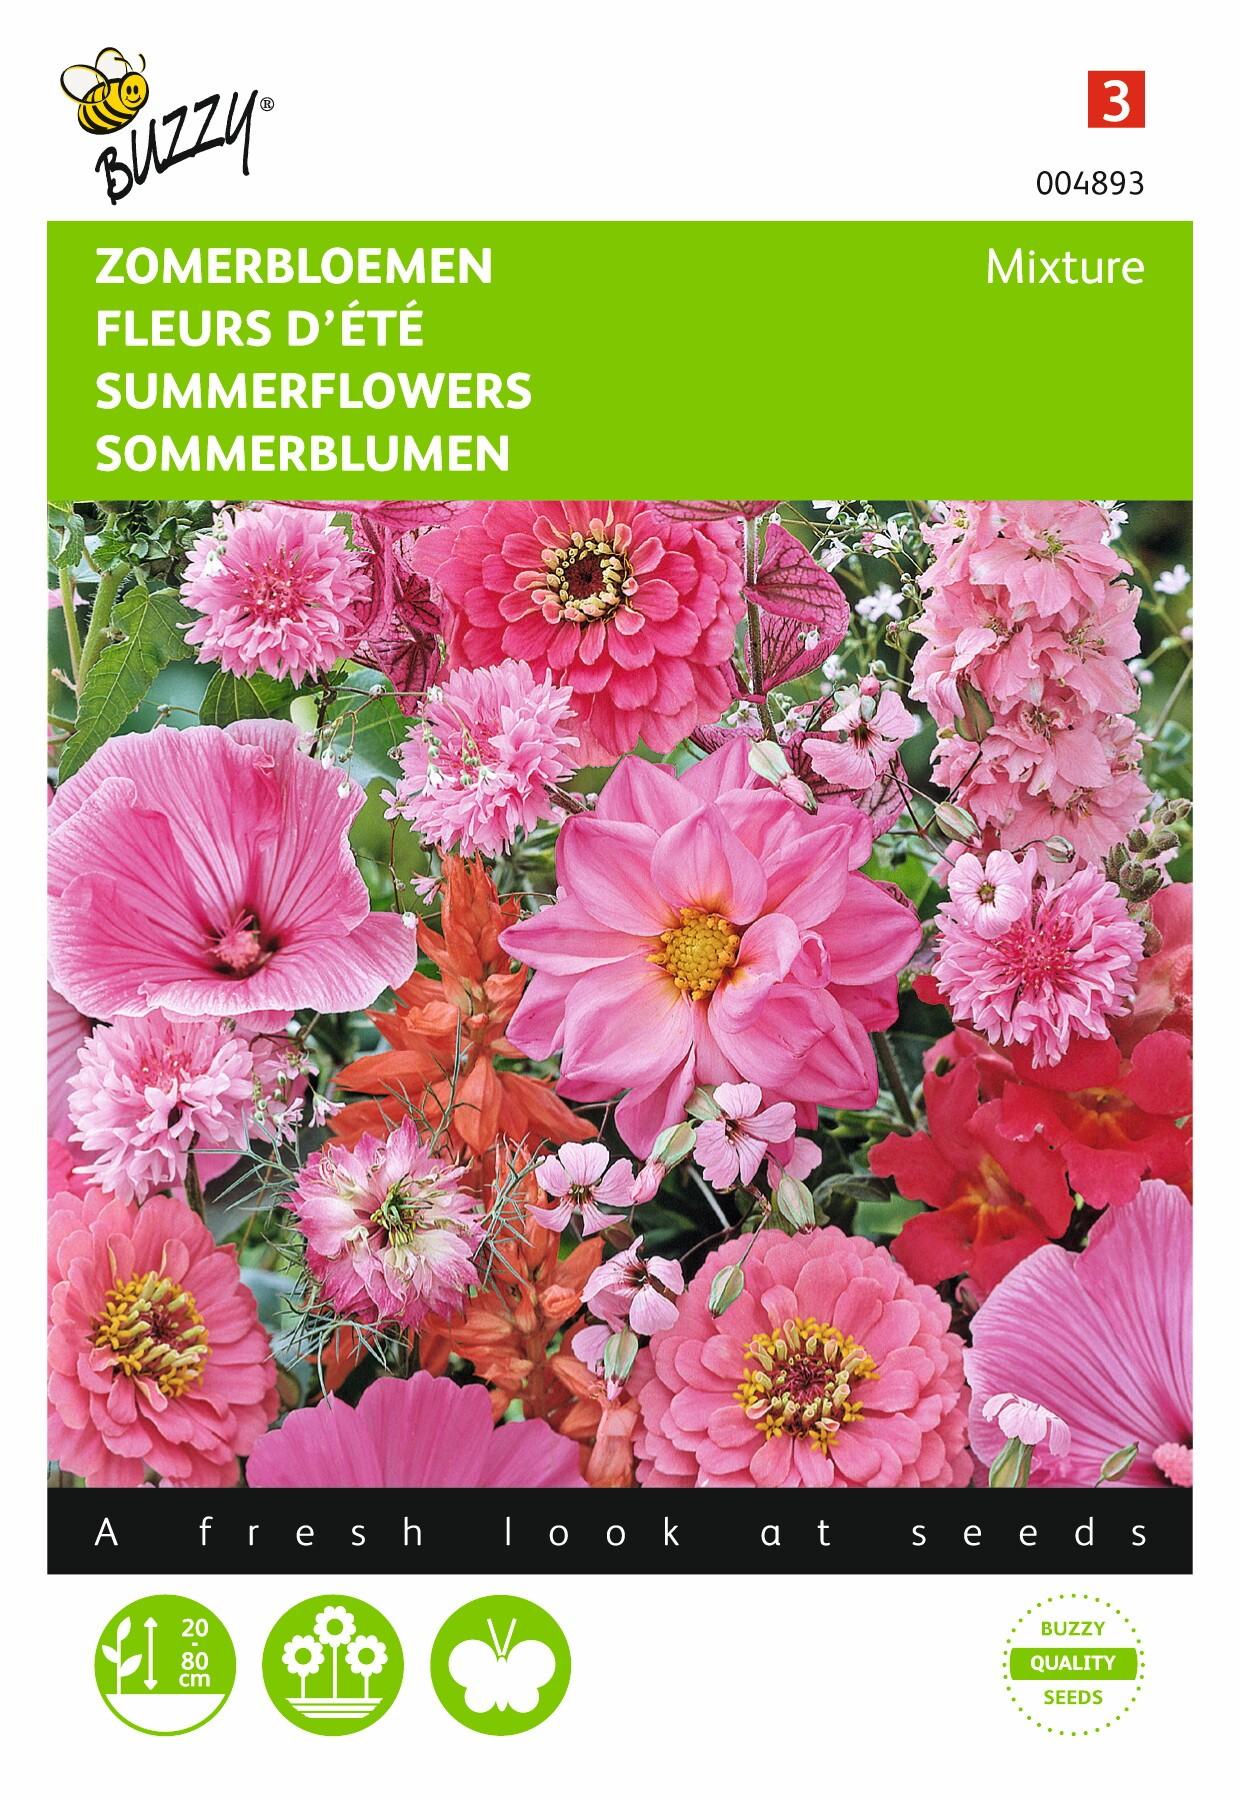 Zomerbloemen rood/rose tinten